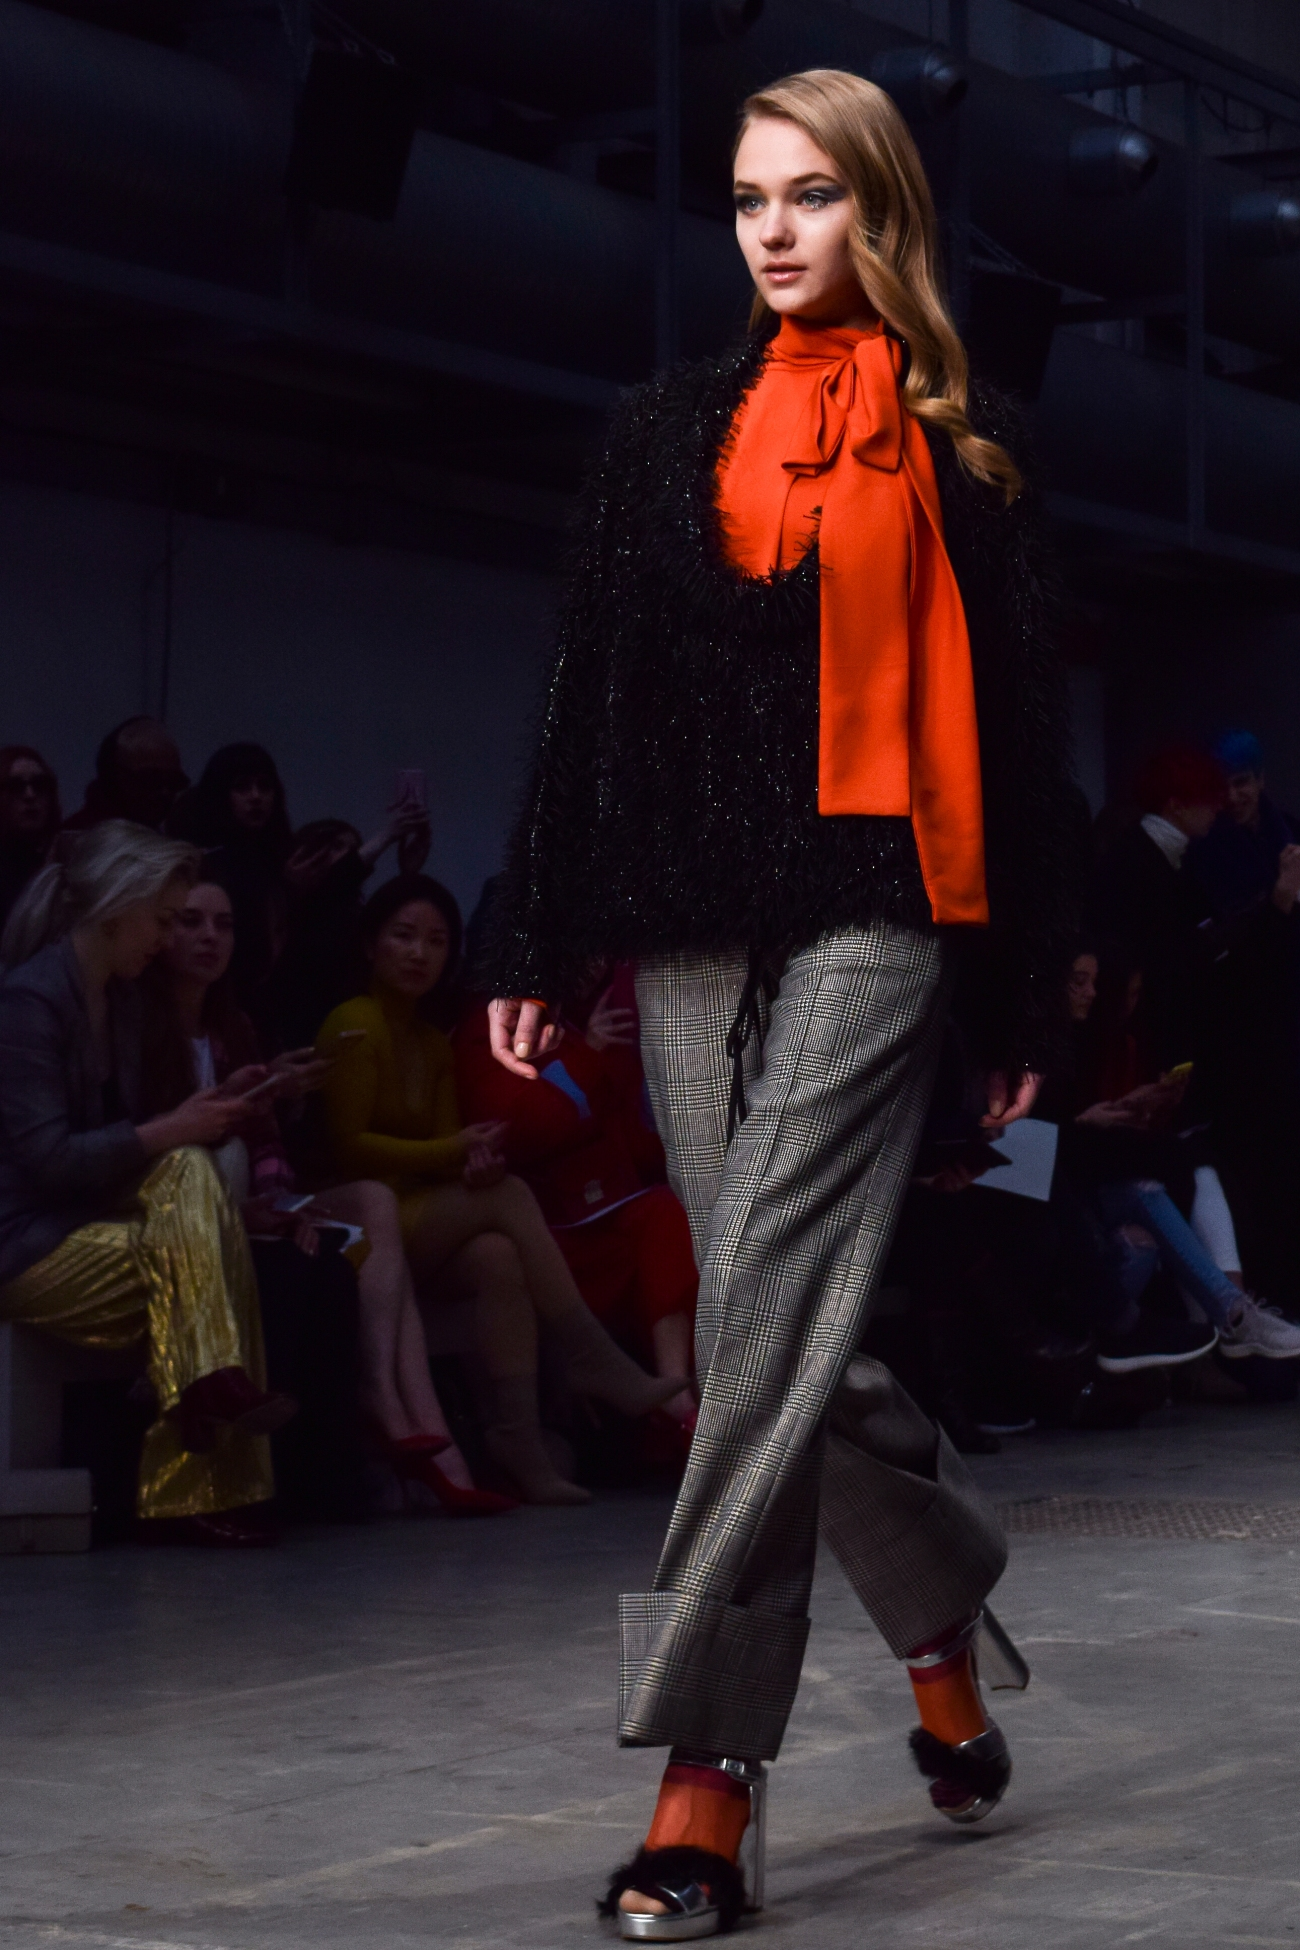 Milan Fashion Week Show Diary | Balázs Zsálek